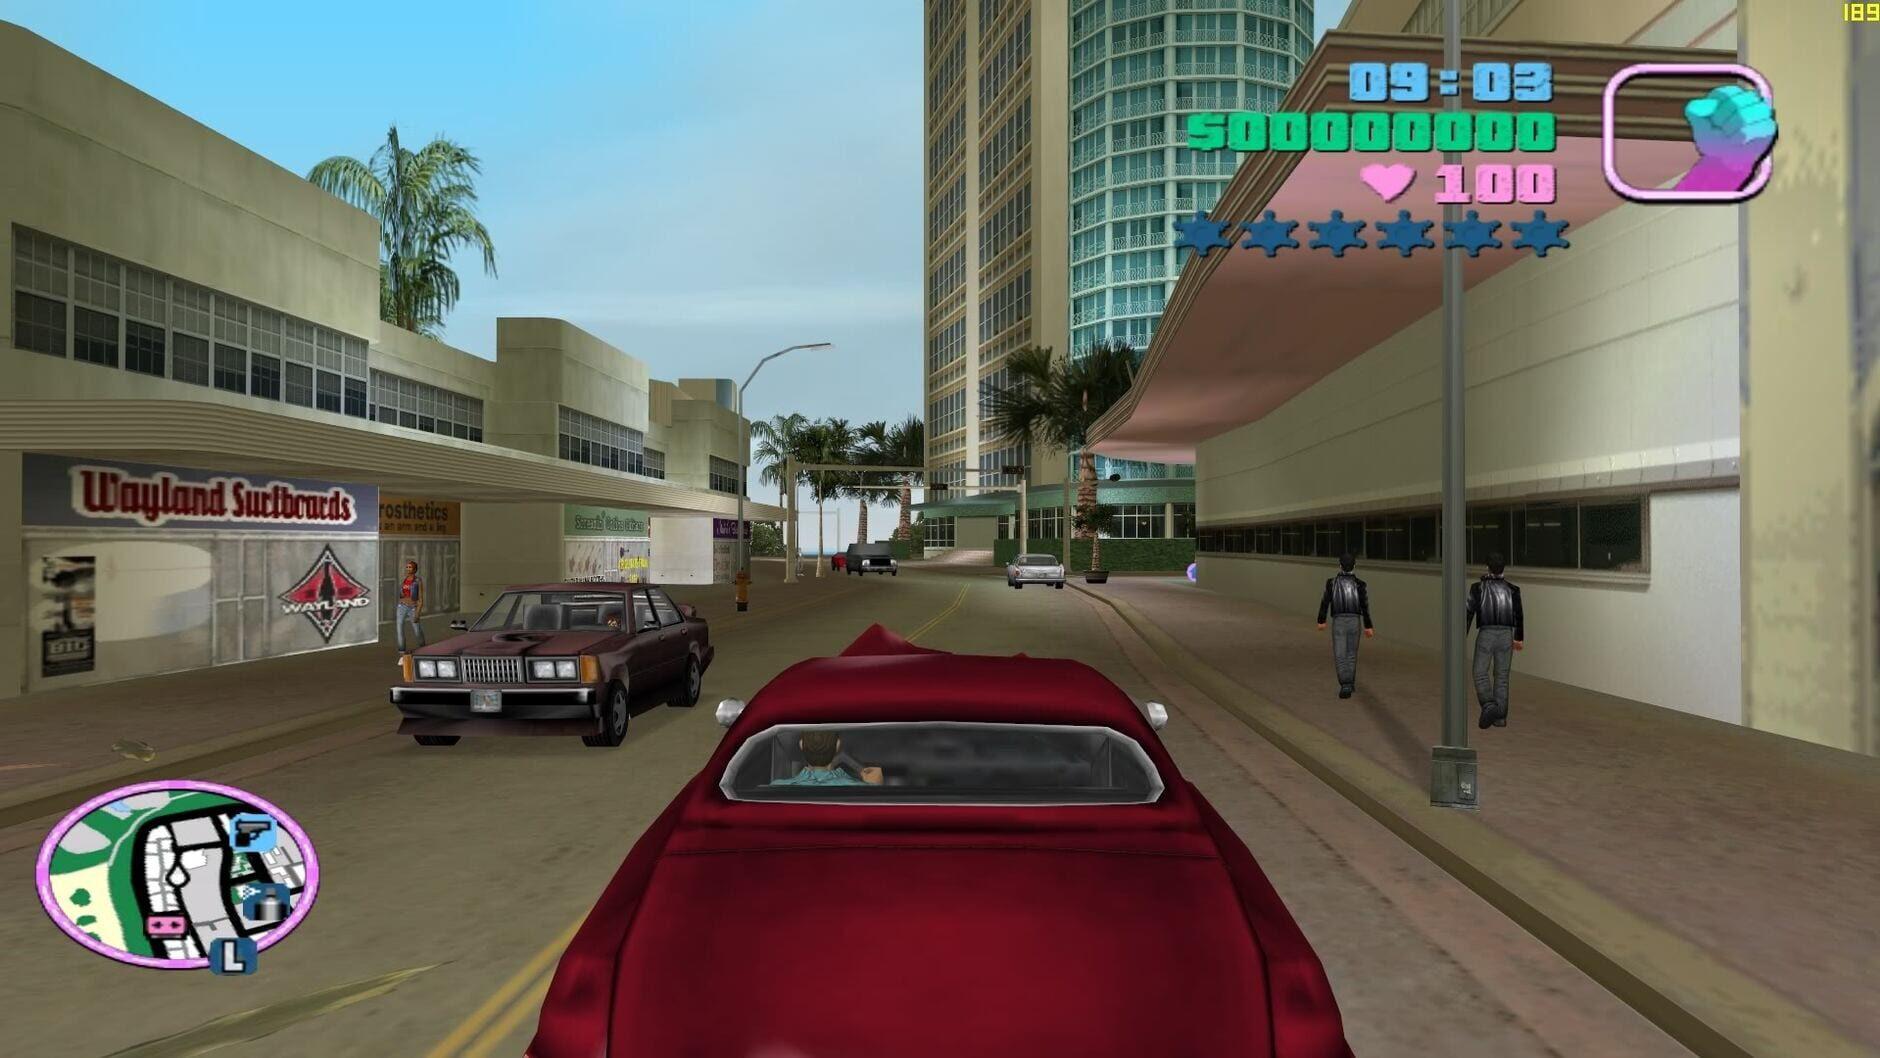 Grand Theft Auto: Vice City - 3